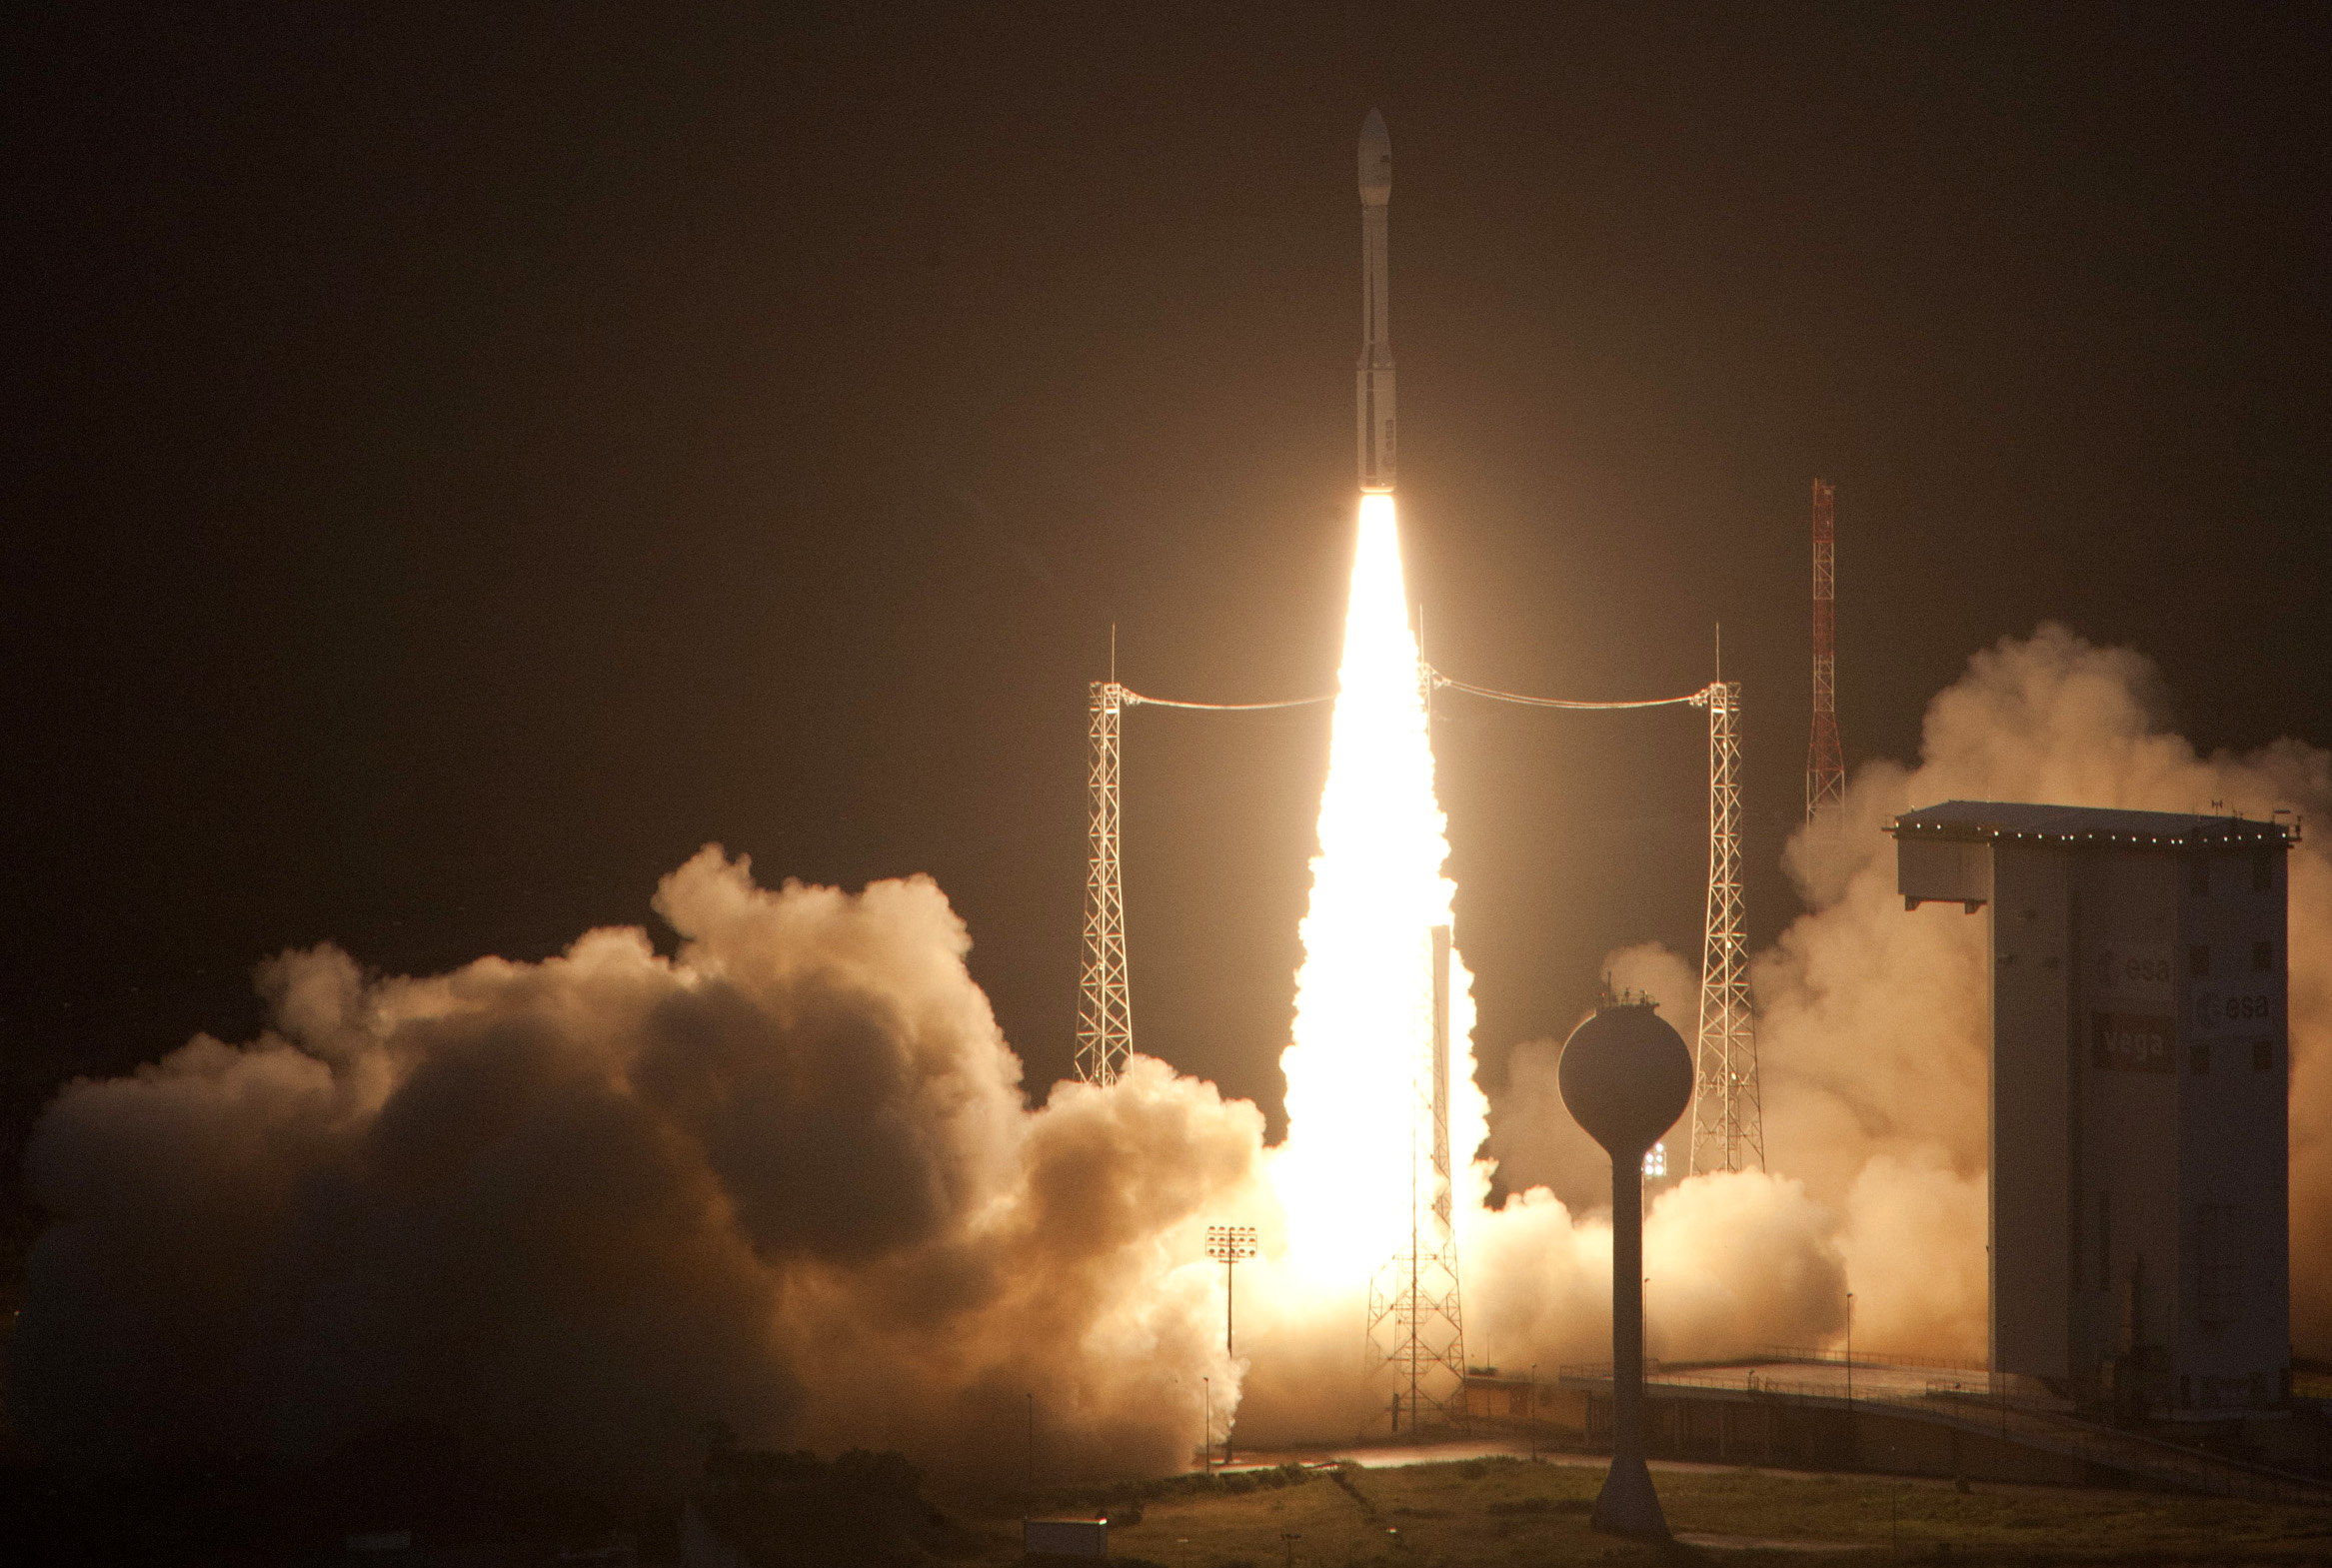 Europe Launches New Vega Rocket on Maiden Voyage Europe Laun